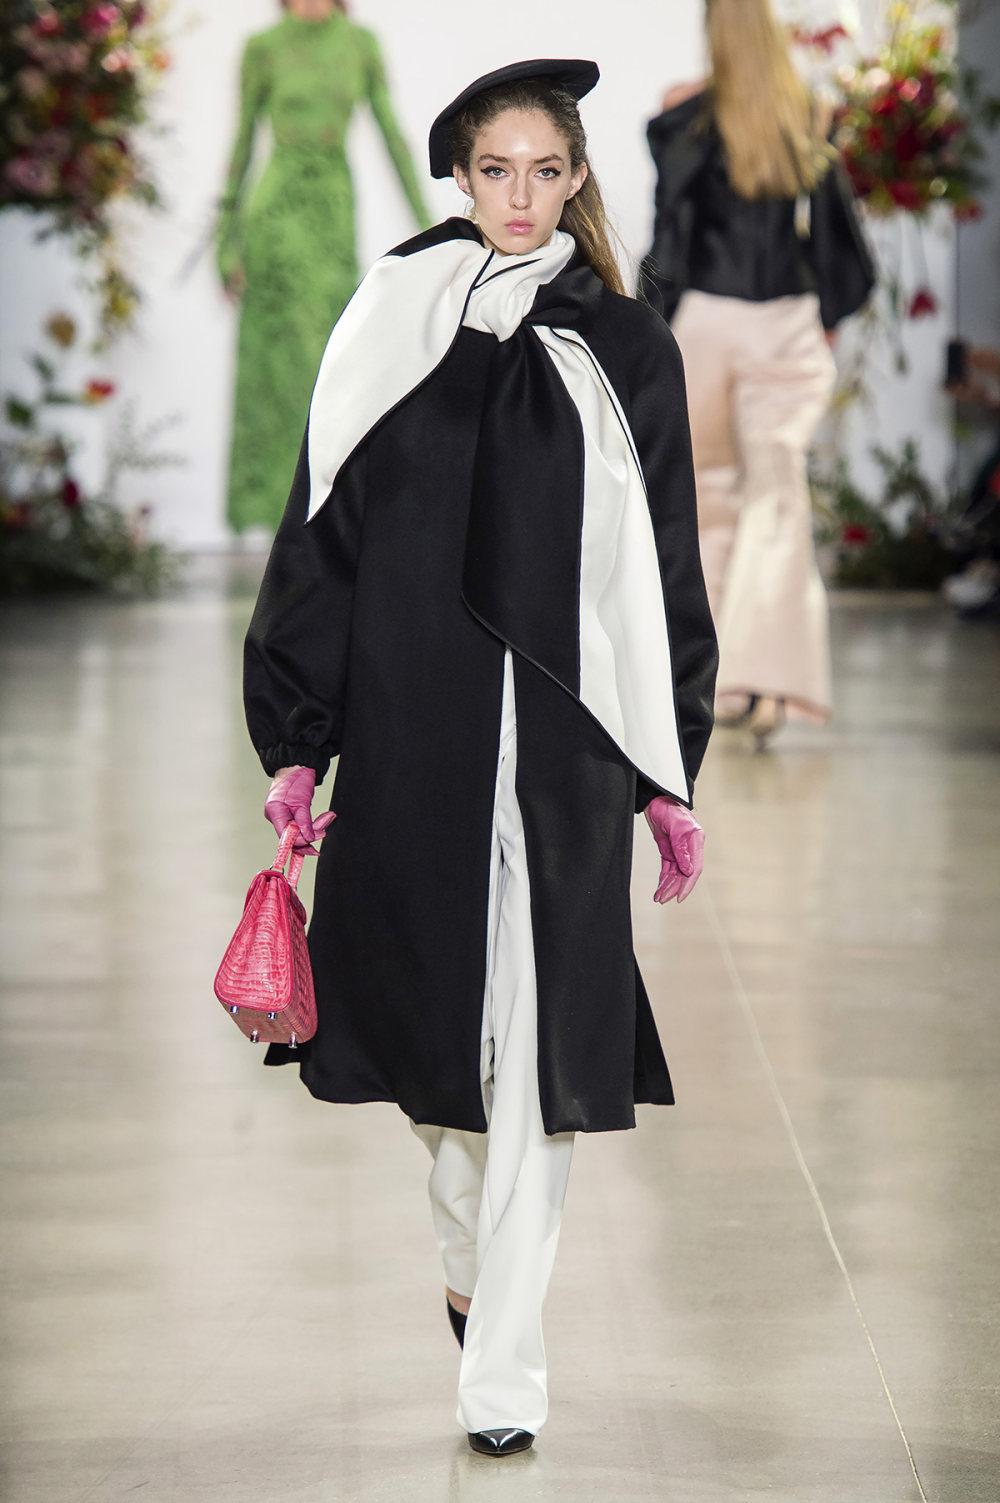 Bibhu Mohapatra时装系列颜色点缀蕾丝刺绣和结构的压轴礼服-9.jpg